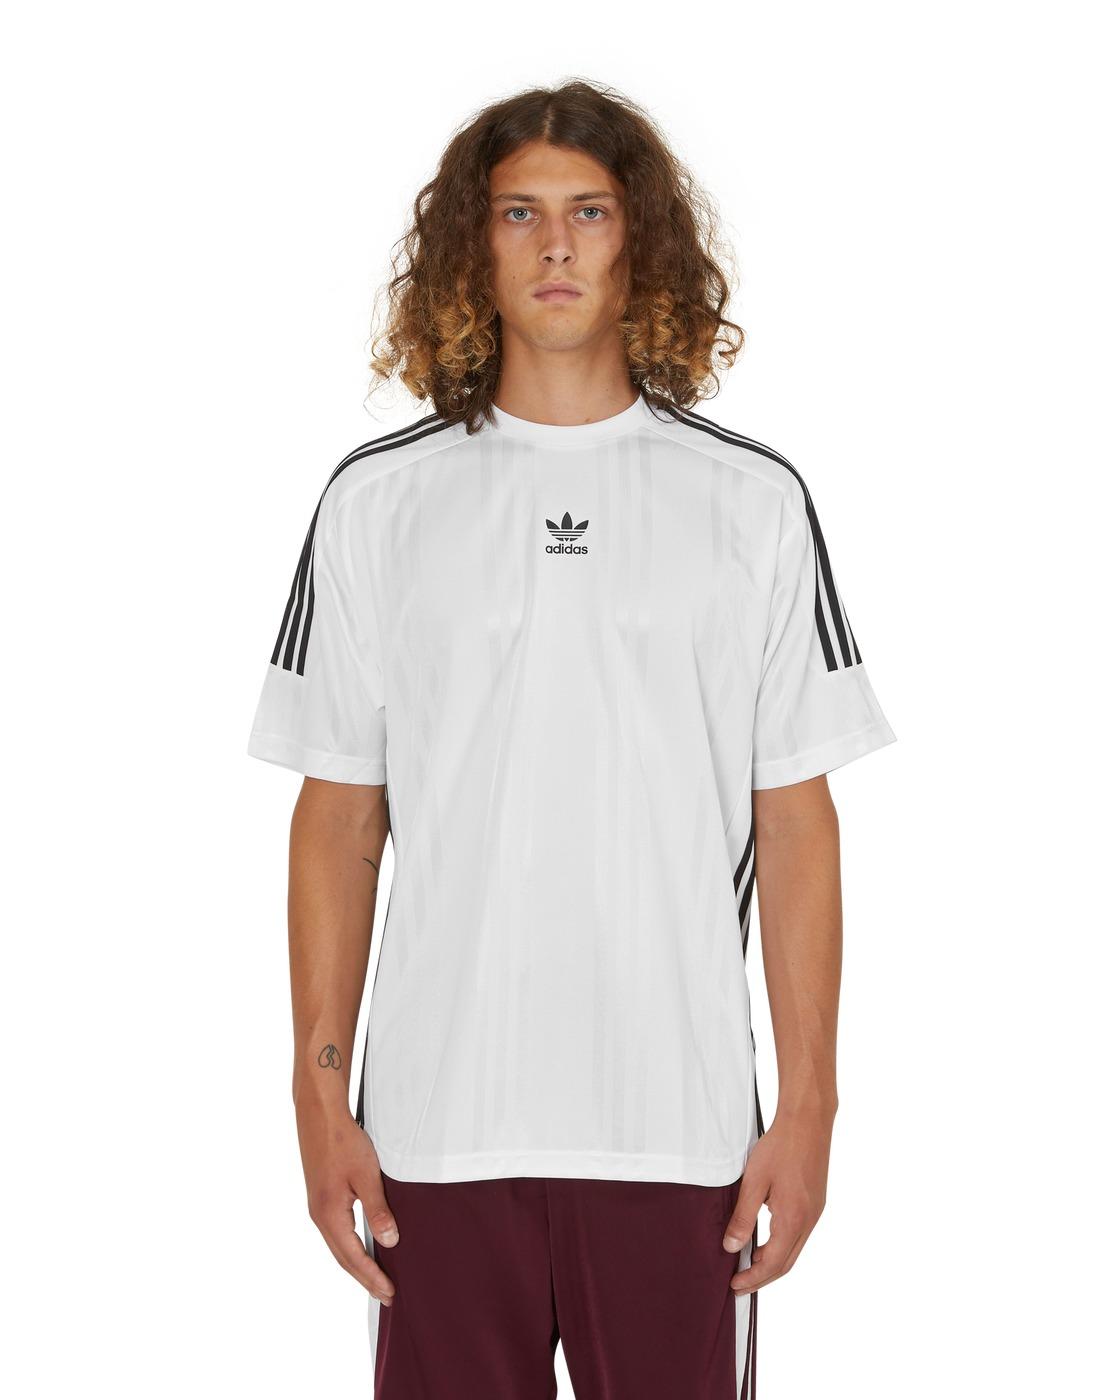 Adidas Originals Jaq 3 Str Jrsy White/Black